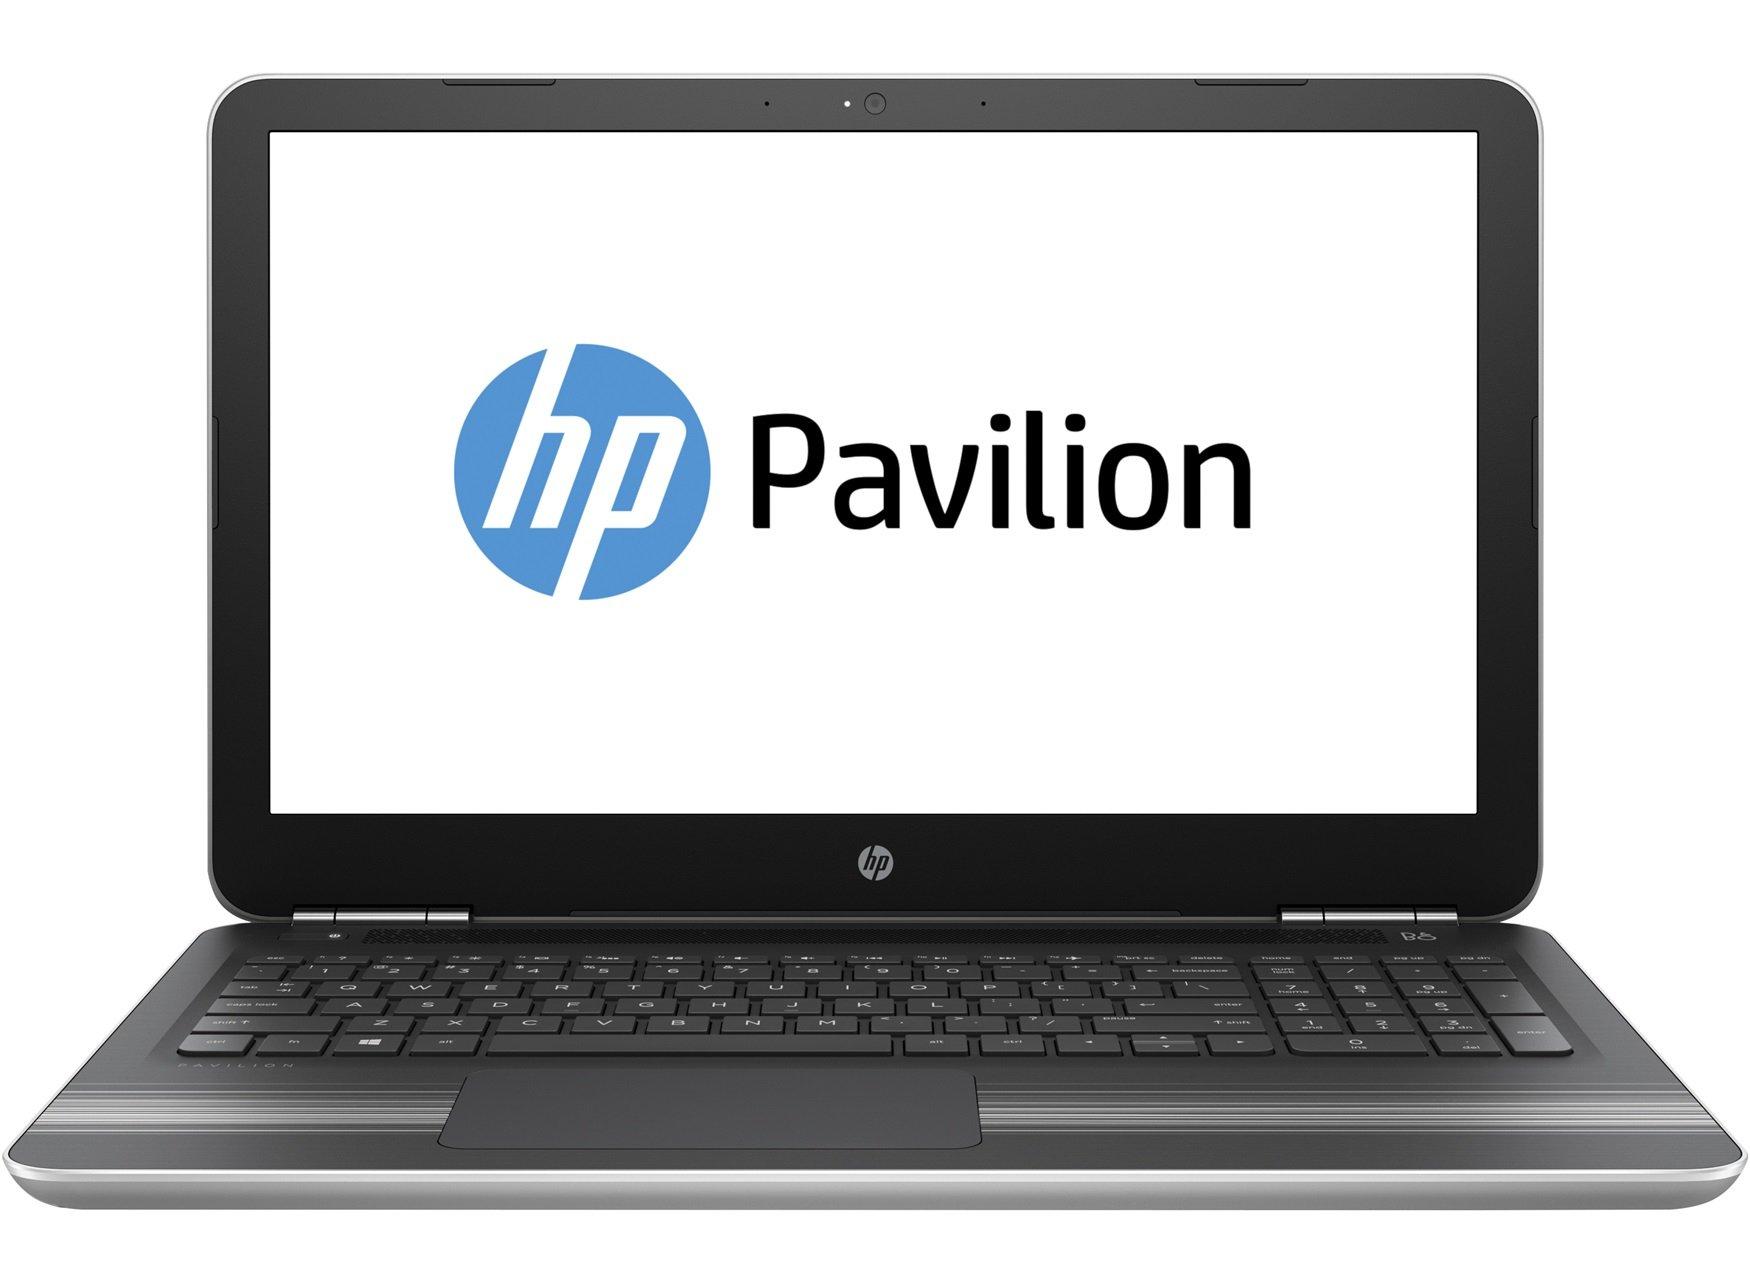 HP Pavilion 15-au010wm 15.6 Inch Laptop (Intel Core i7-6500U 2.5GHz, 12 GB DDR4-2133 SDRAM, 1 TB 5400 rpm SATA Hard Drive, Windows 10), Silver